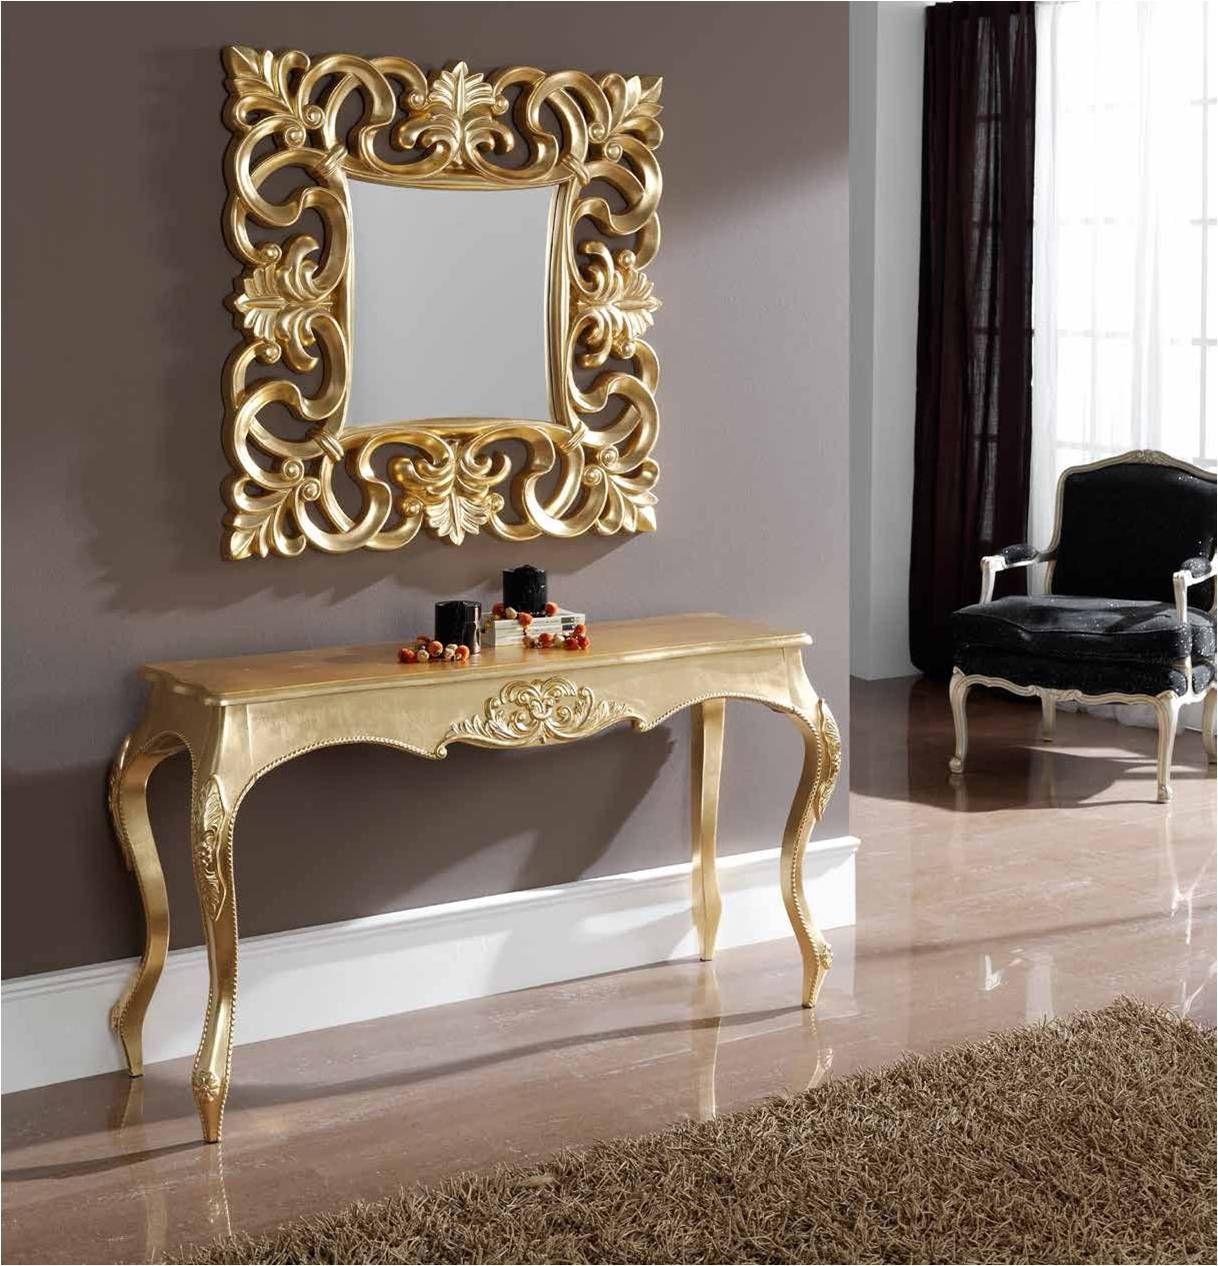 espejo barroco cuadrado de resina acabado oro cm x cm http